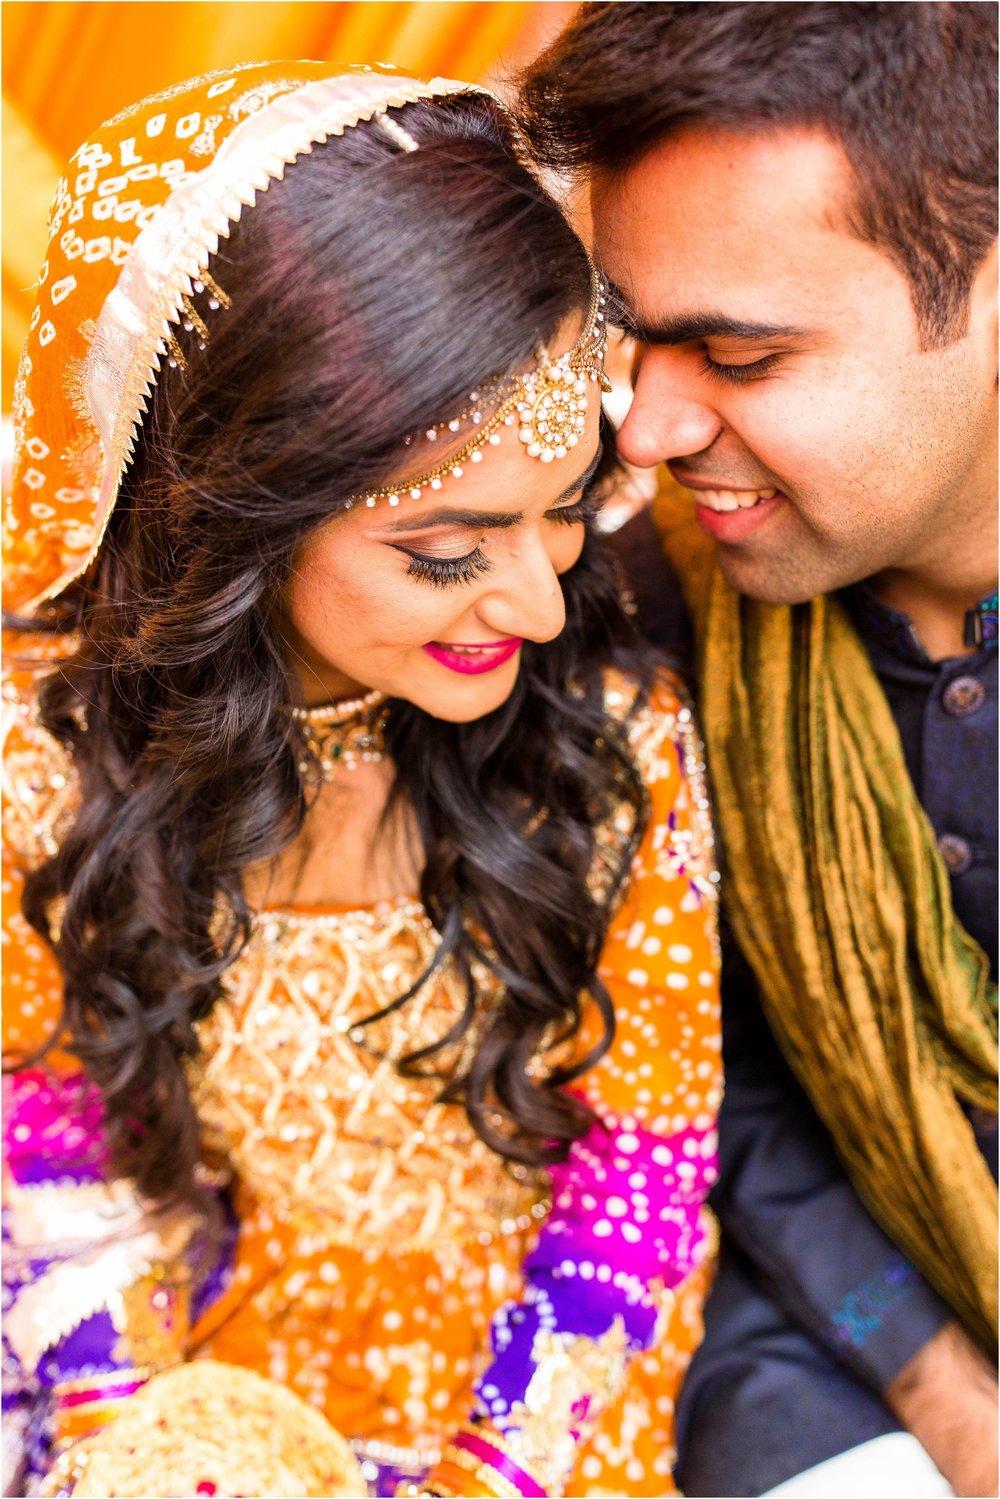 Best-of-2017-Weddings-Toronto-Mississauga-Brampton-Scarborough-GTA-Pakistani-Indian-Wedding-Engagement-Photographer-Photography_0125.jpg